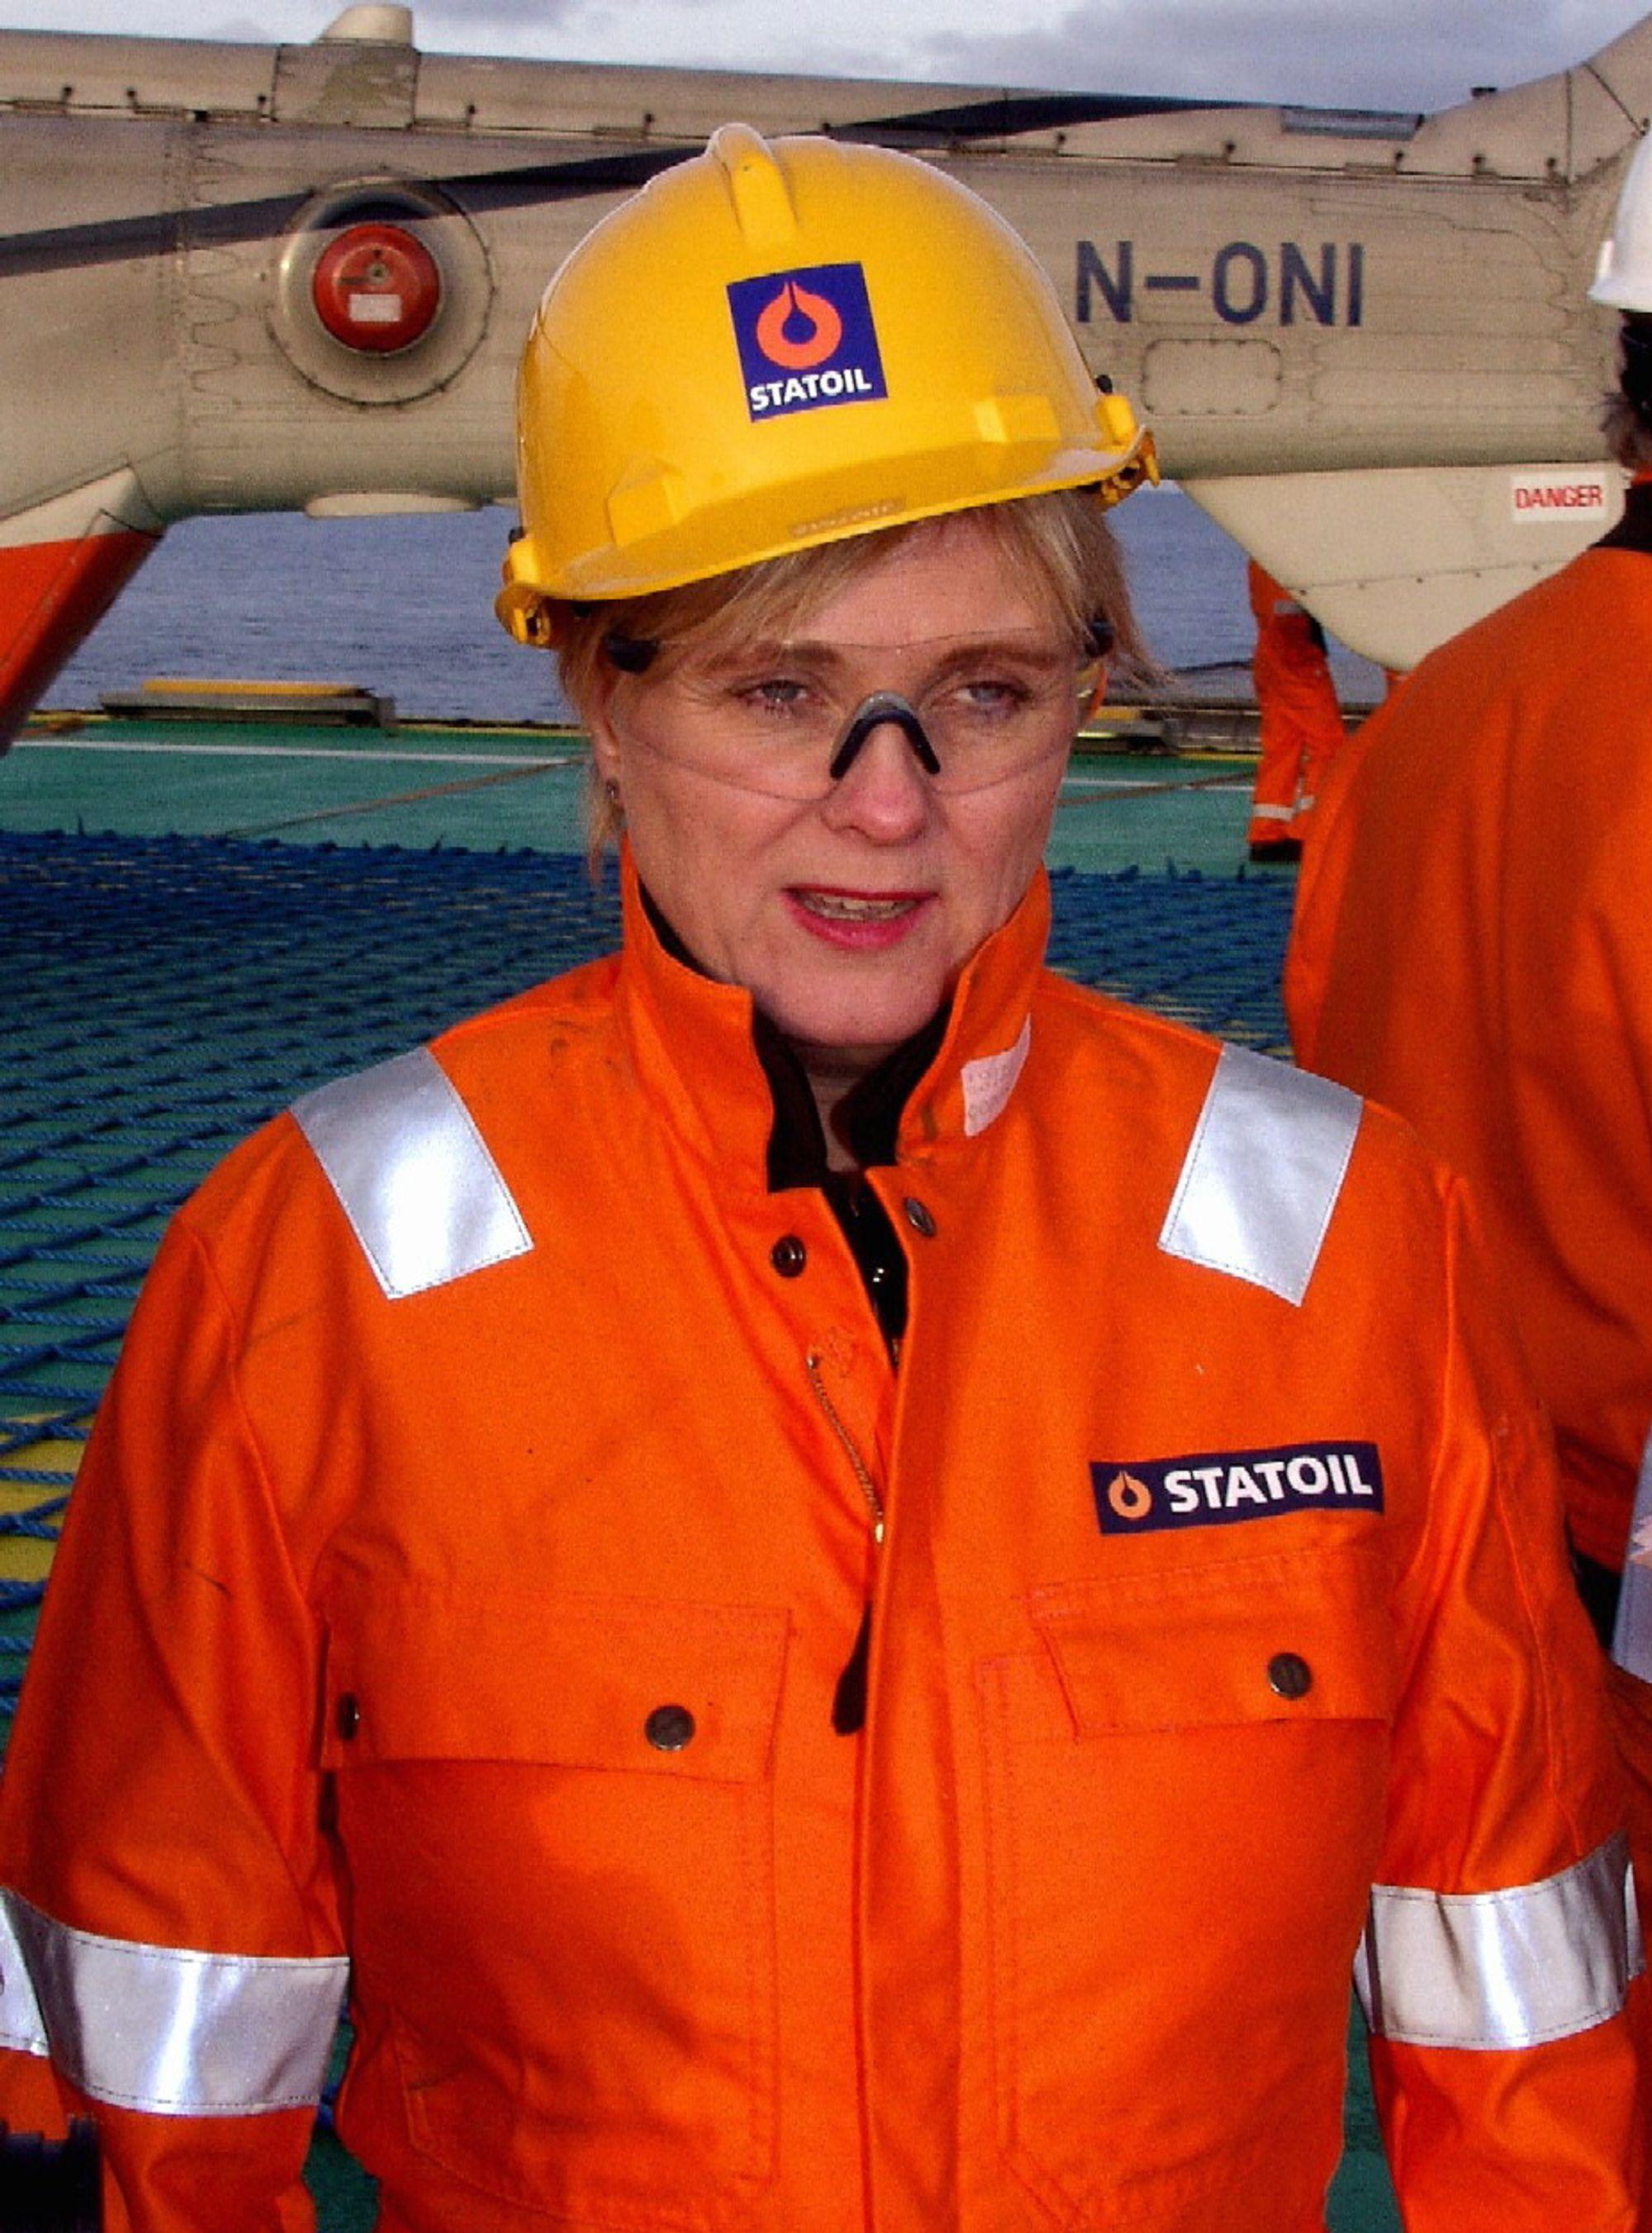 KRAFTKABEL: Statsråd Thorhild Widvey gir grønt lys for kraftutveksling mellom Norge og Nederland. Det er handelen med grønn kraft som lokker. FOTO:AJS